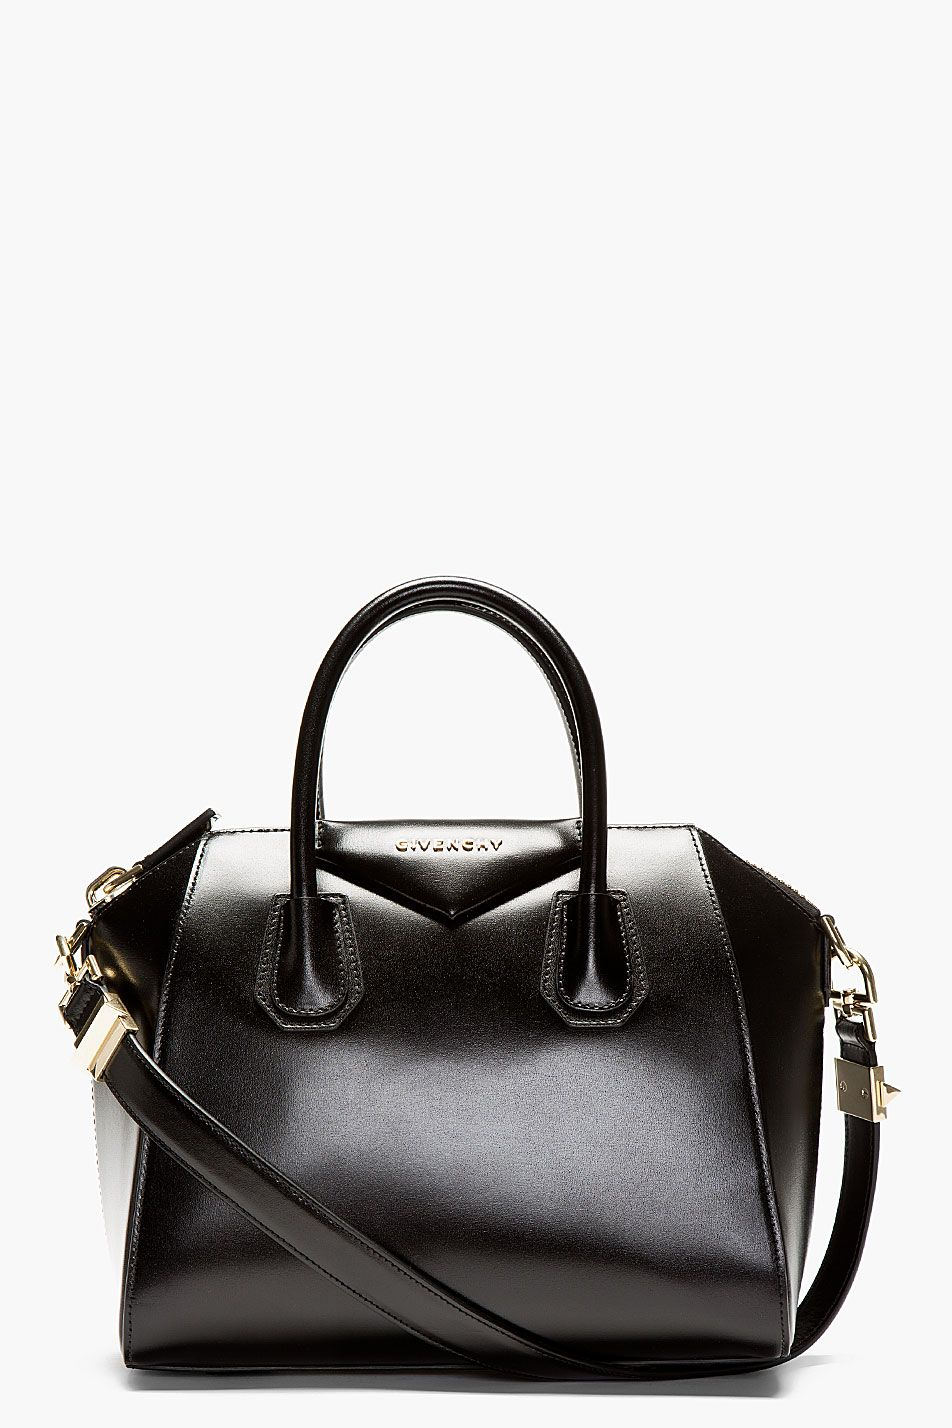 f97615173b0b #womens #bags #shoulder bags Givenchy Black Leather Antigona Small Shoulder  Bag